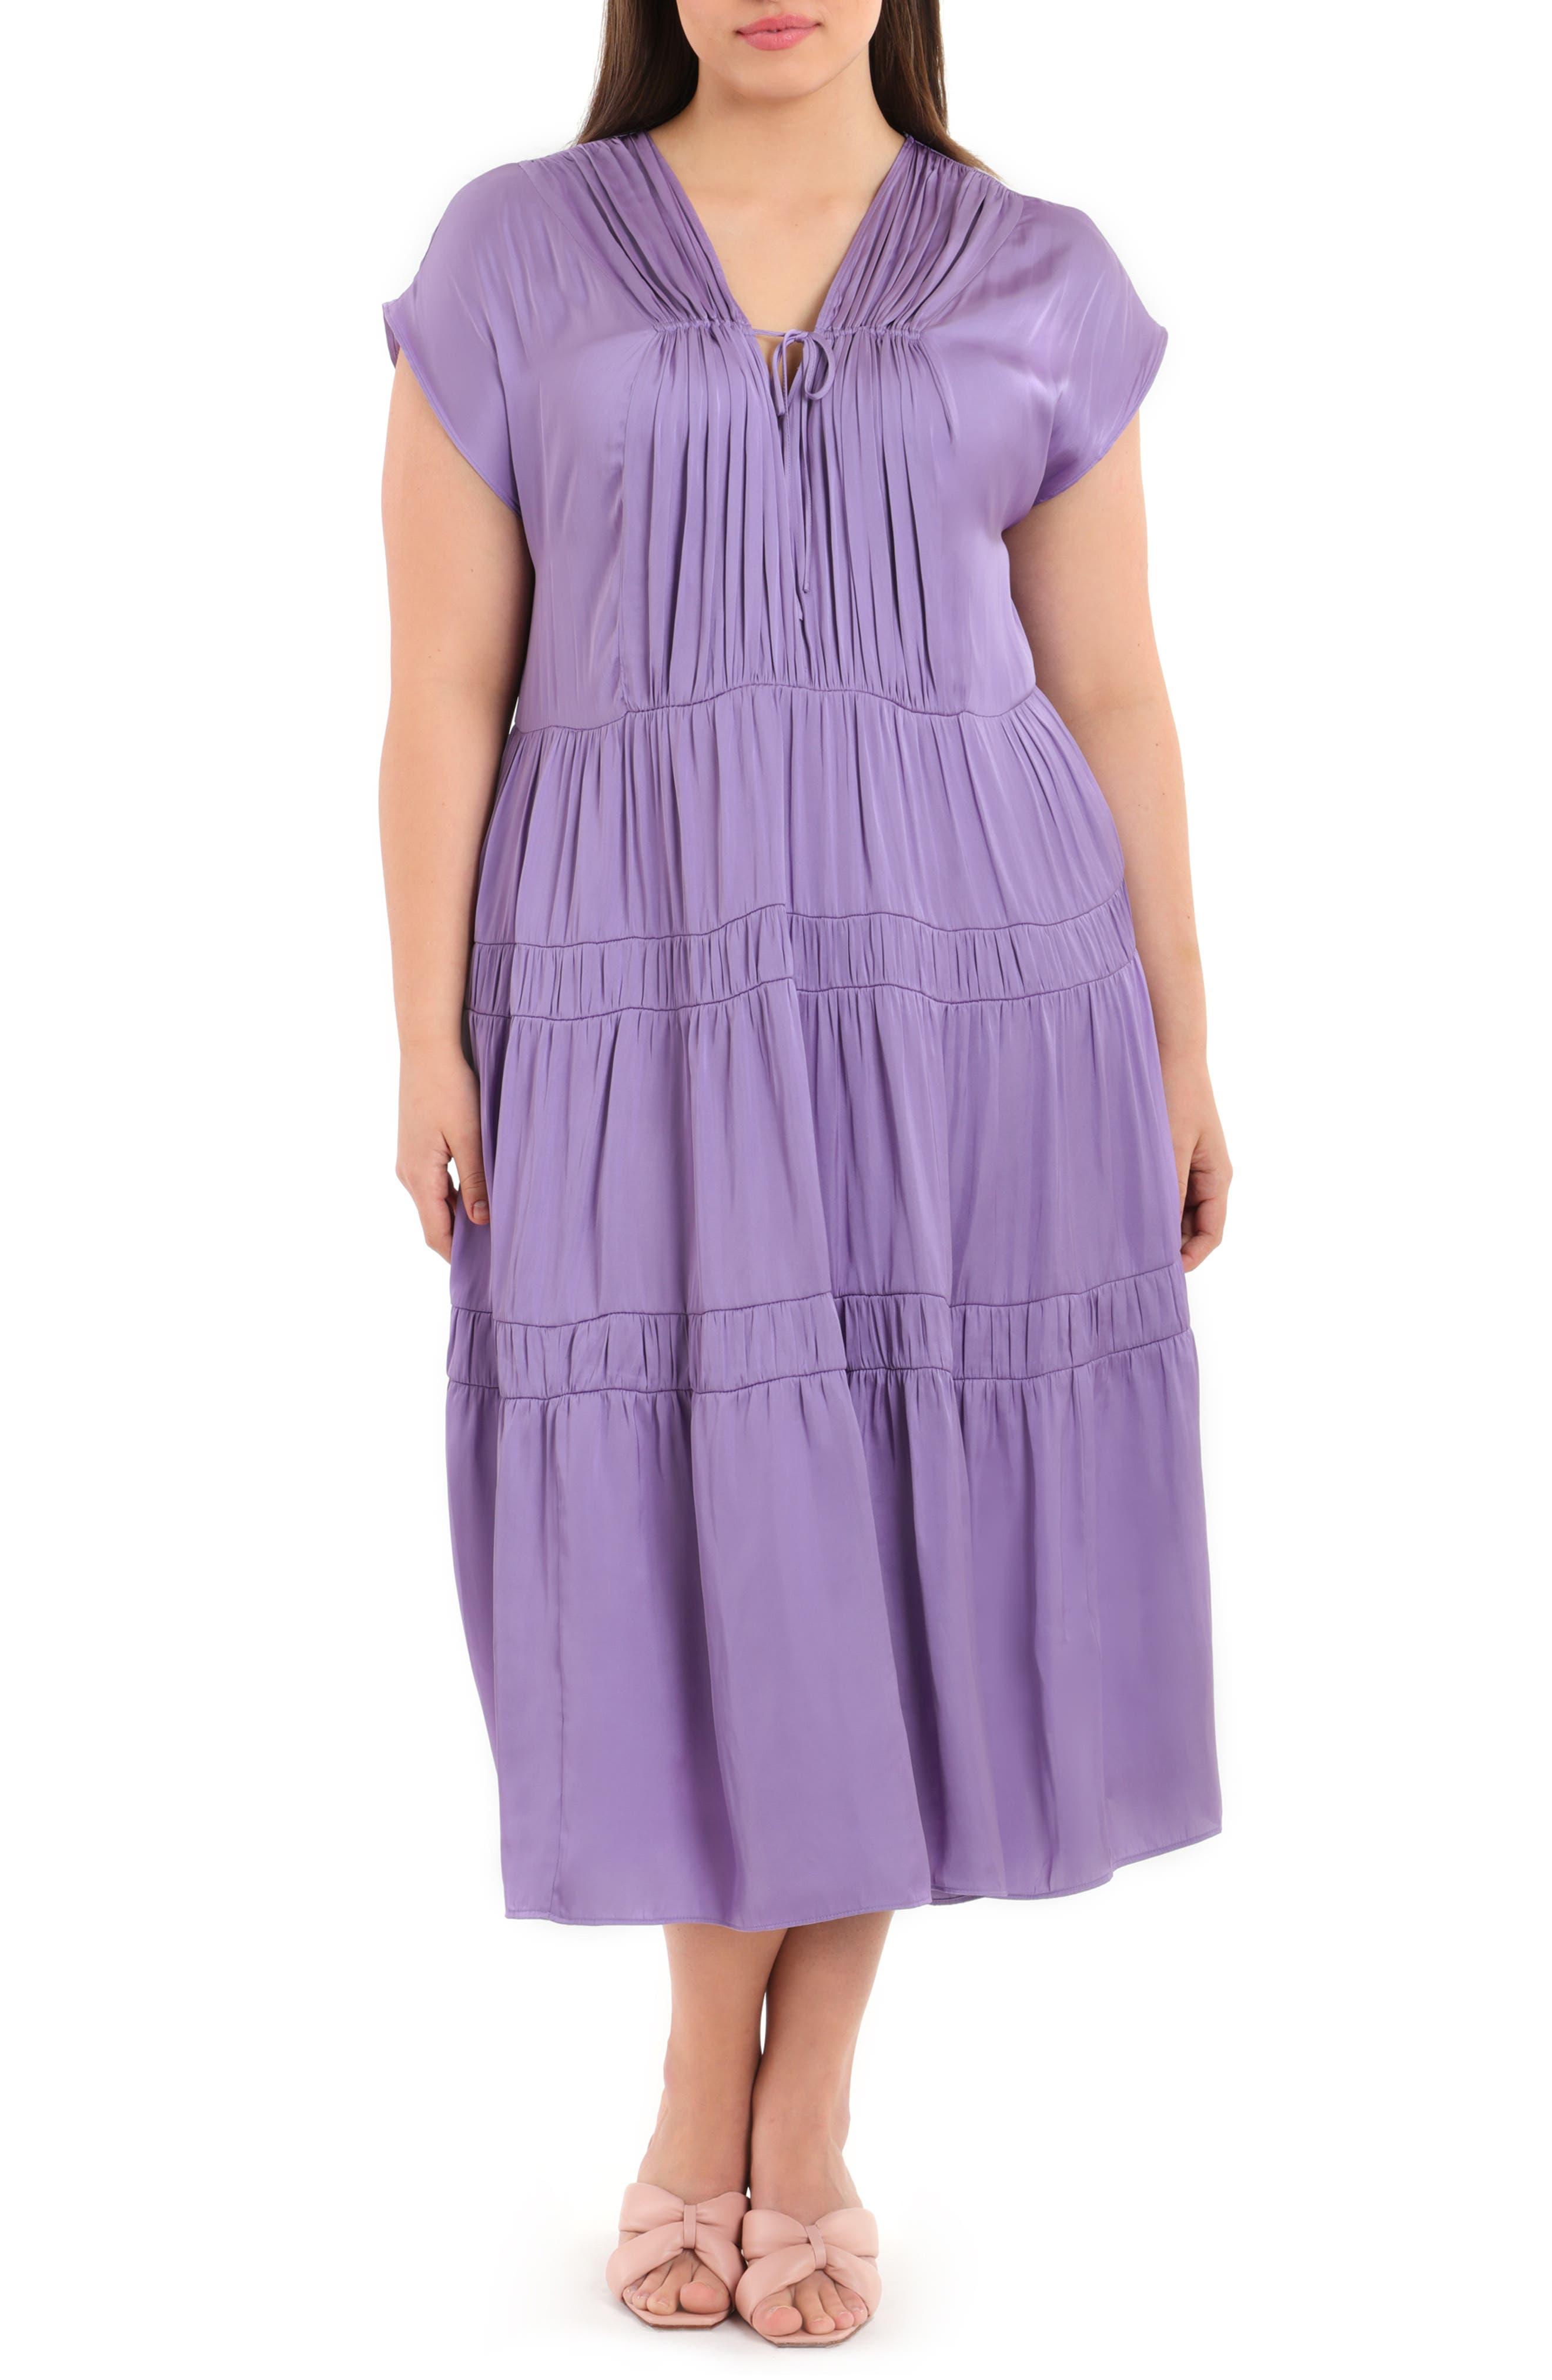 Tiered Brushed Satin Midi Dress